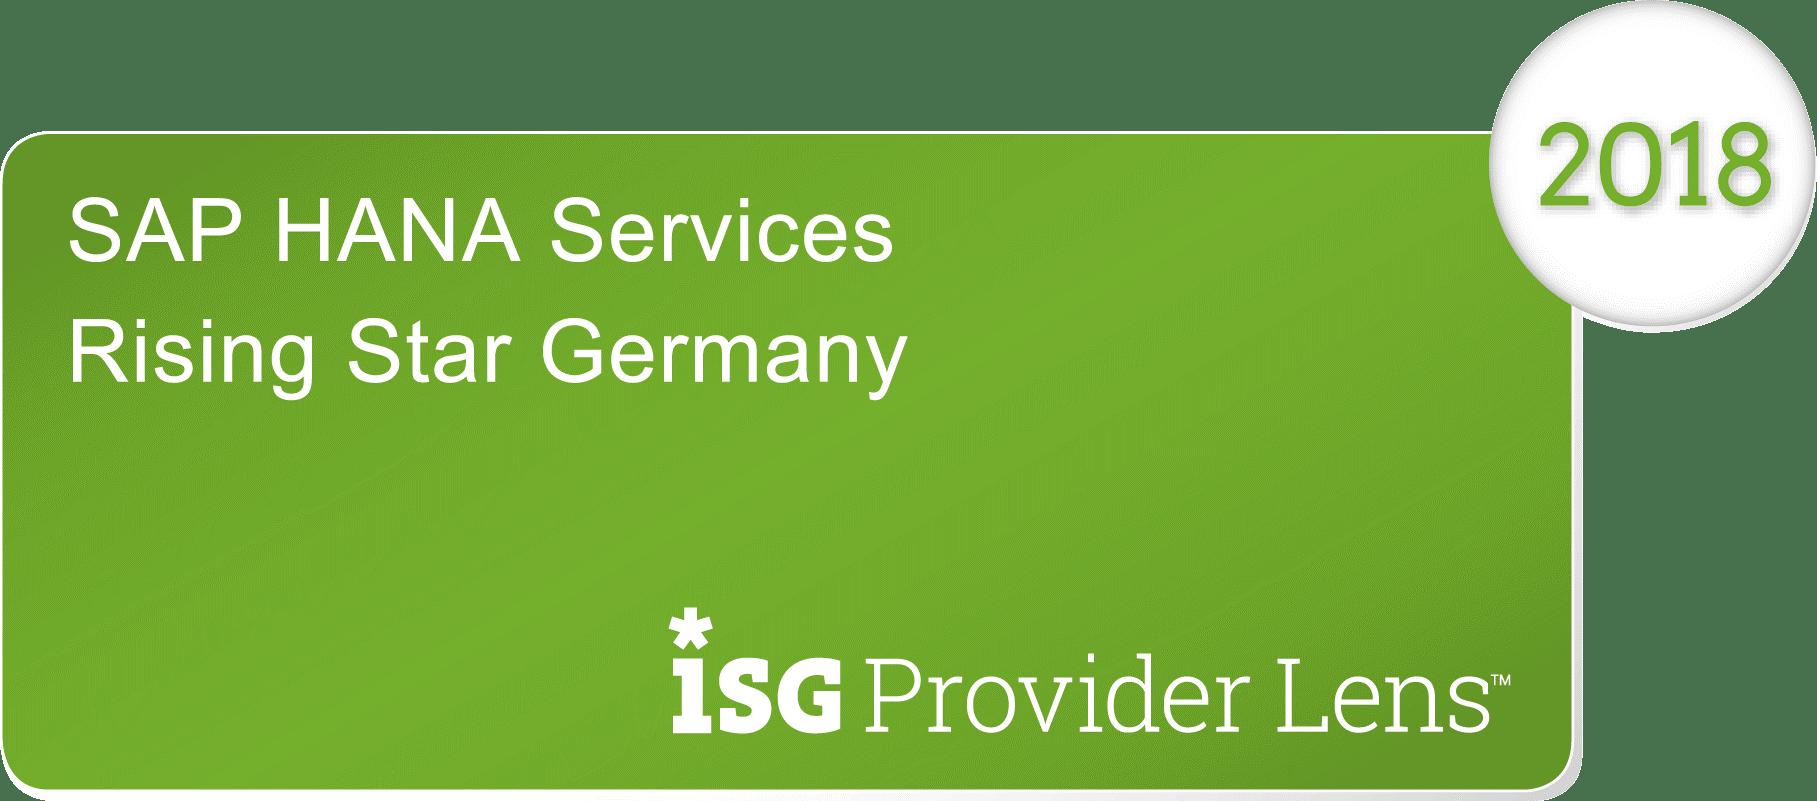 "News Grafik Batch ISG Provider Lens HANA Services 2018 - ISG Provider Lens™: Innovabee ist ""Leader"" unter den SAP S/4HANA-Anbietern"